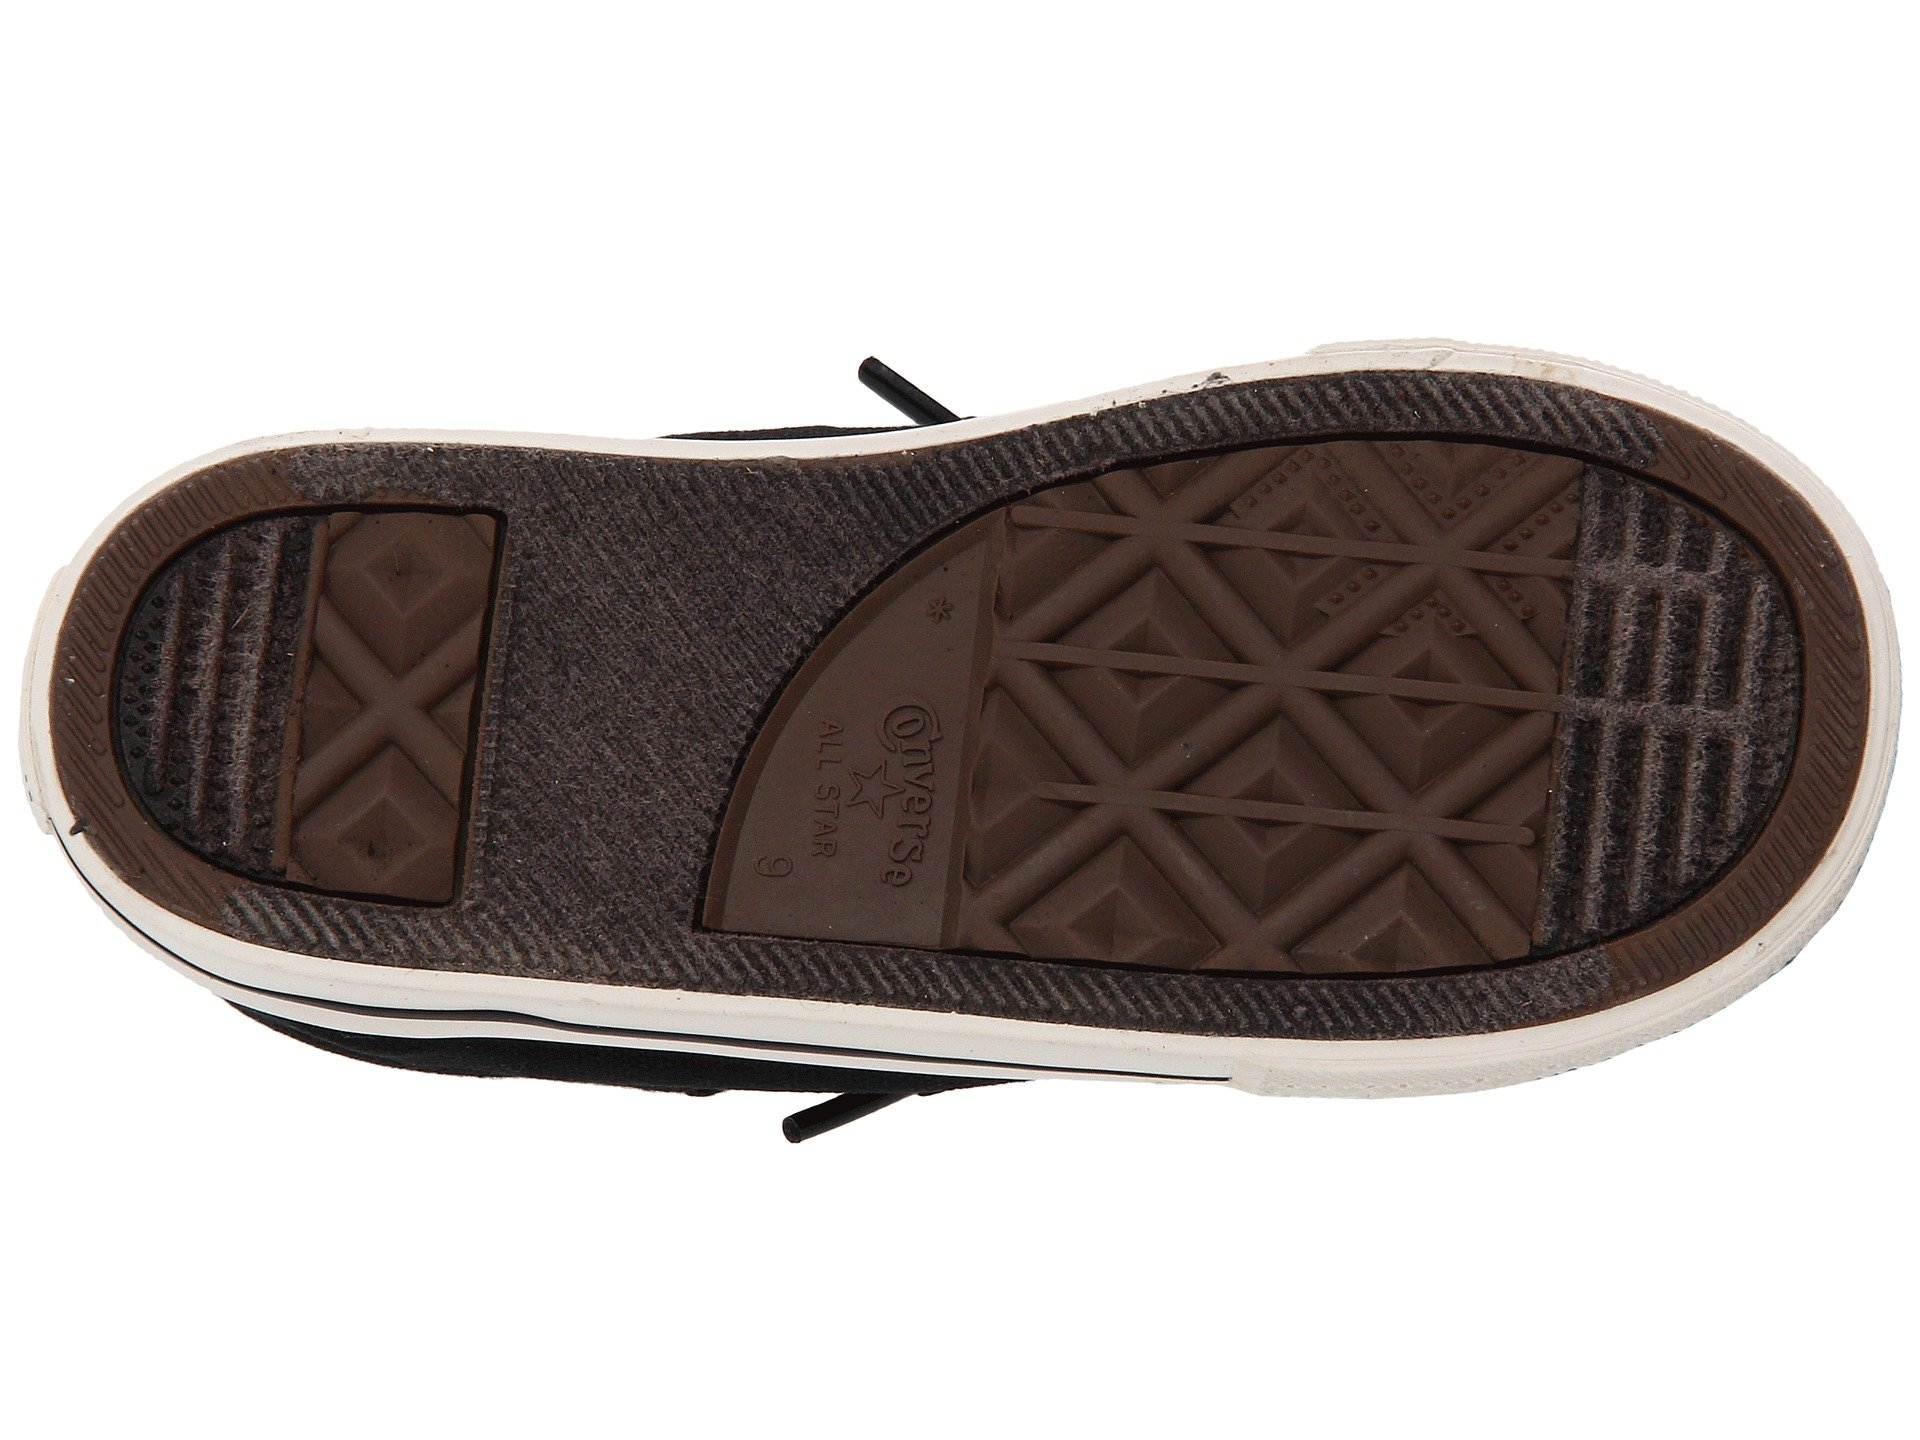 Clean Sick Off Black Suede Shoes